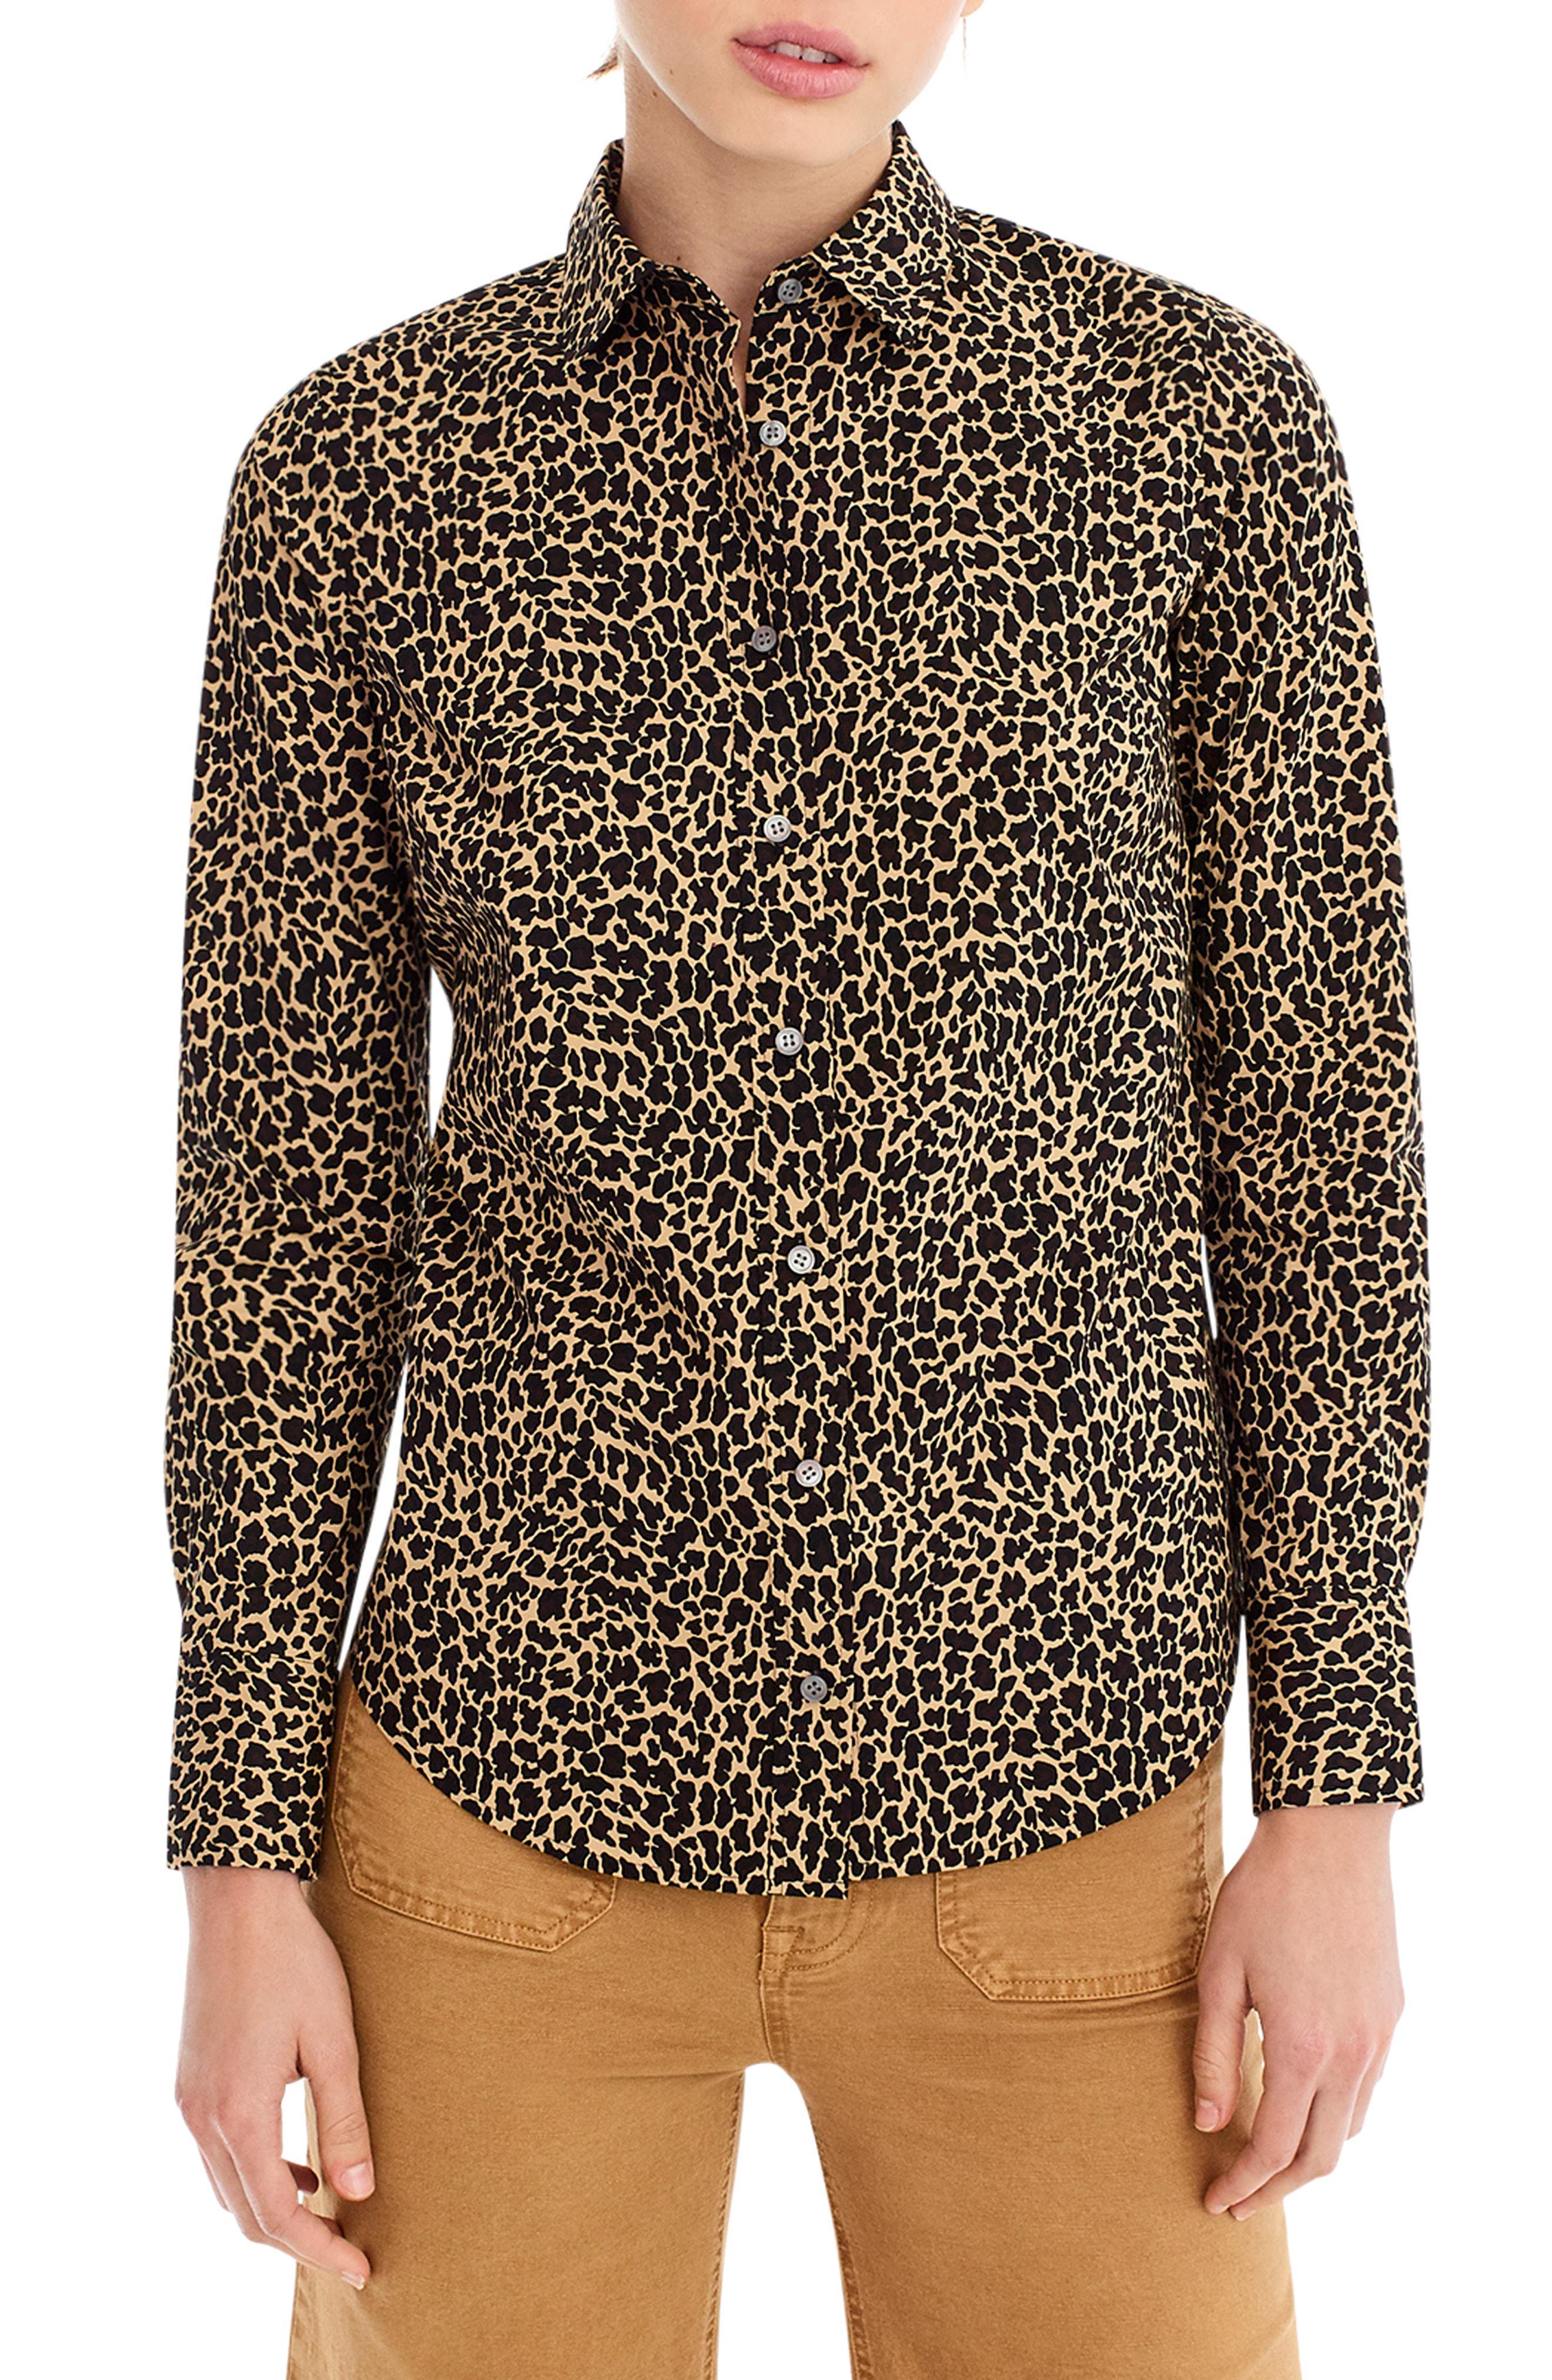 6cf20bc8c31 Lyst - J.Crew Leopard Print Slim Stretch Perfect Shirt in Brown ...